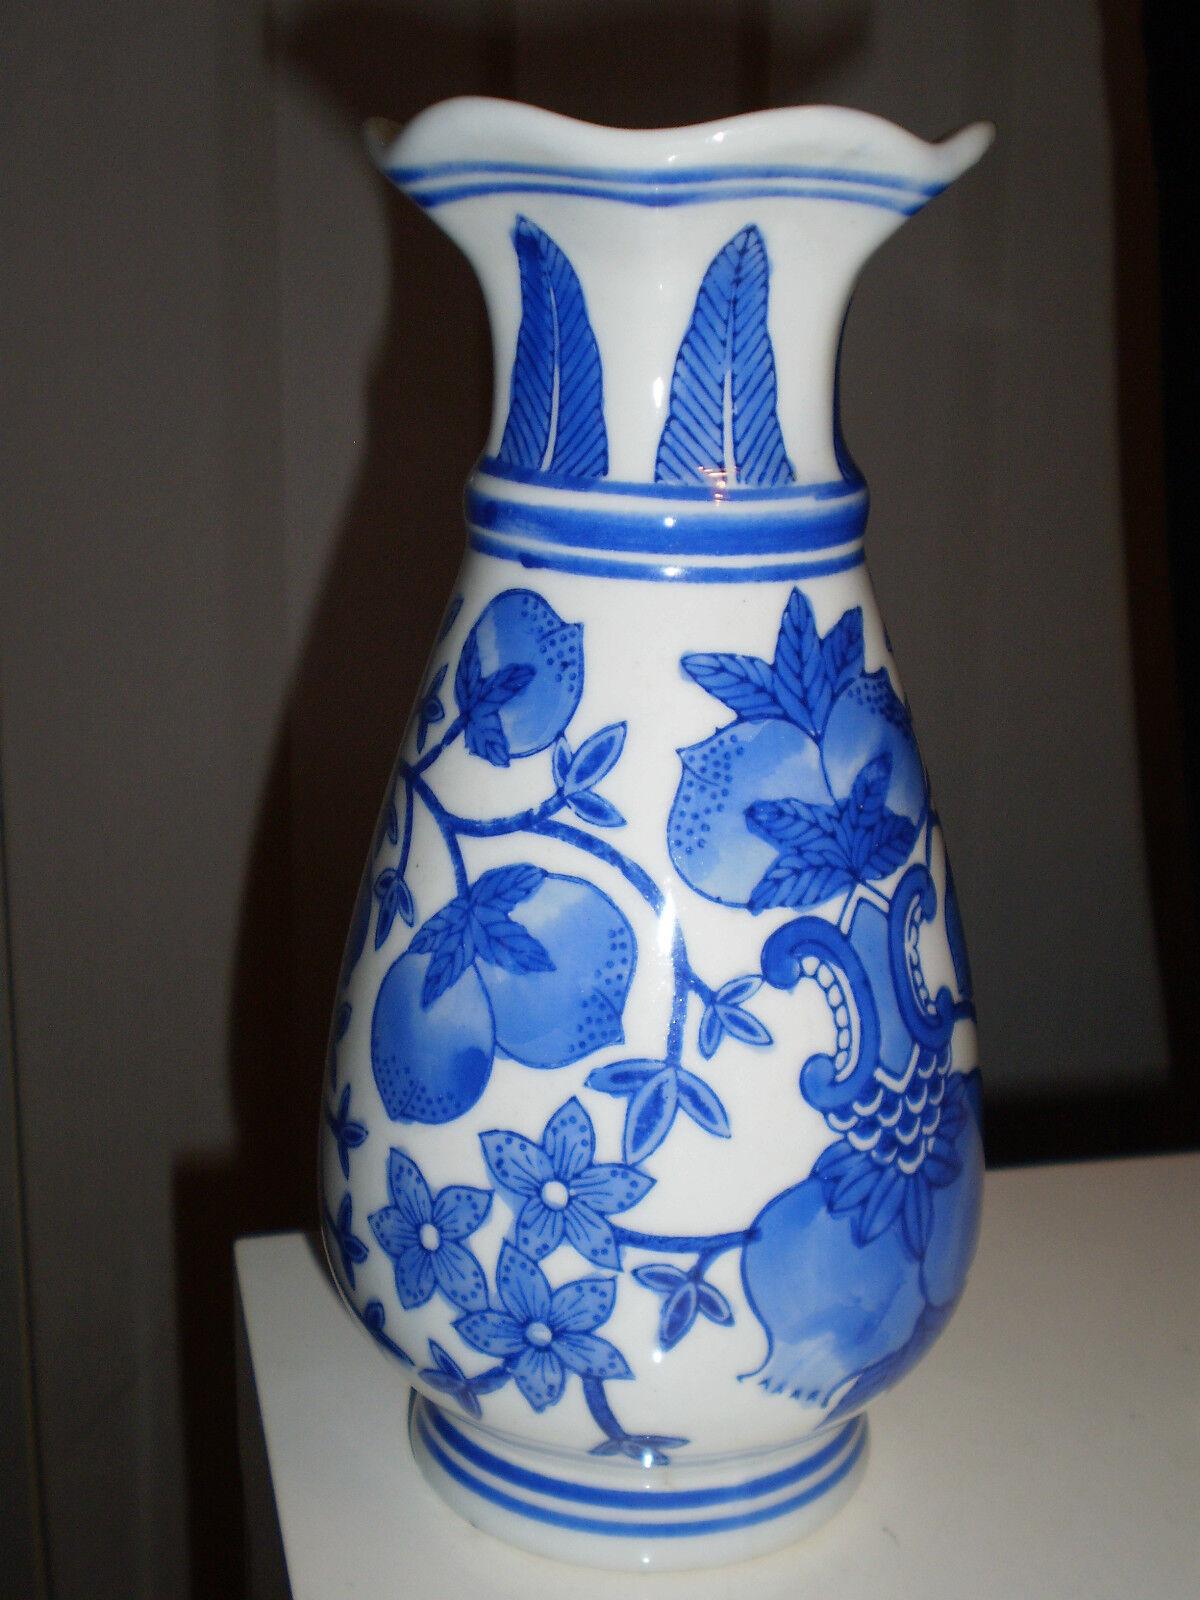 2x porzellan vase blau wei wellenrand vase tischvase bl ten china japan vase eur 24 00. Black Bedroom Furniture Sets. Home Design Ideas